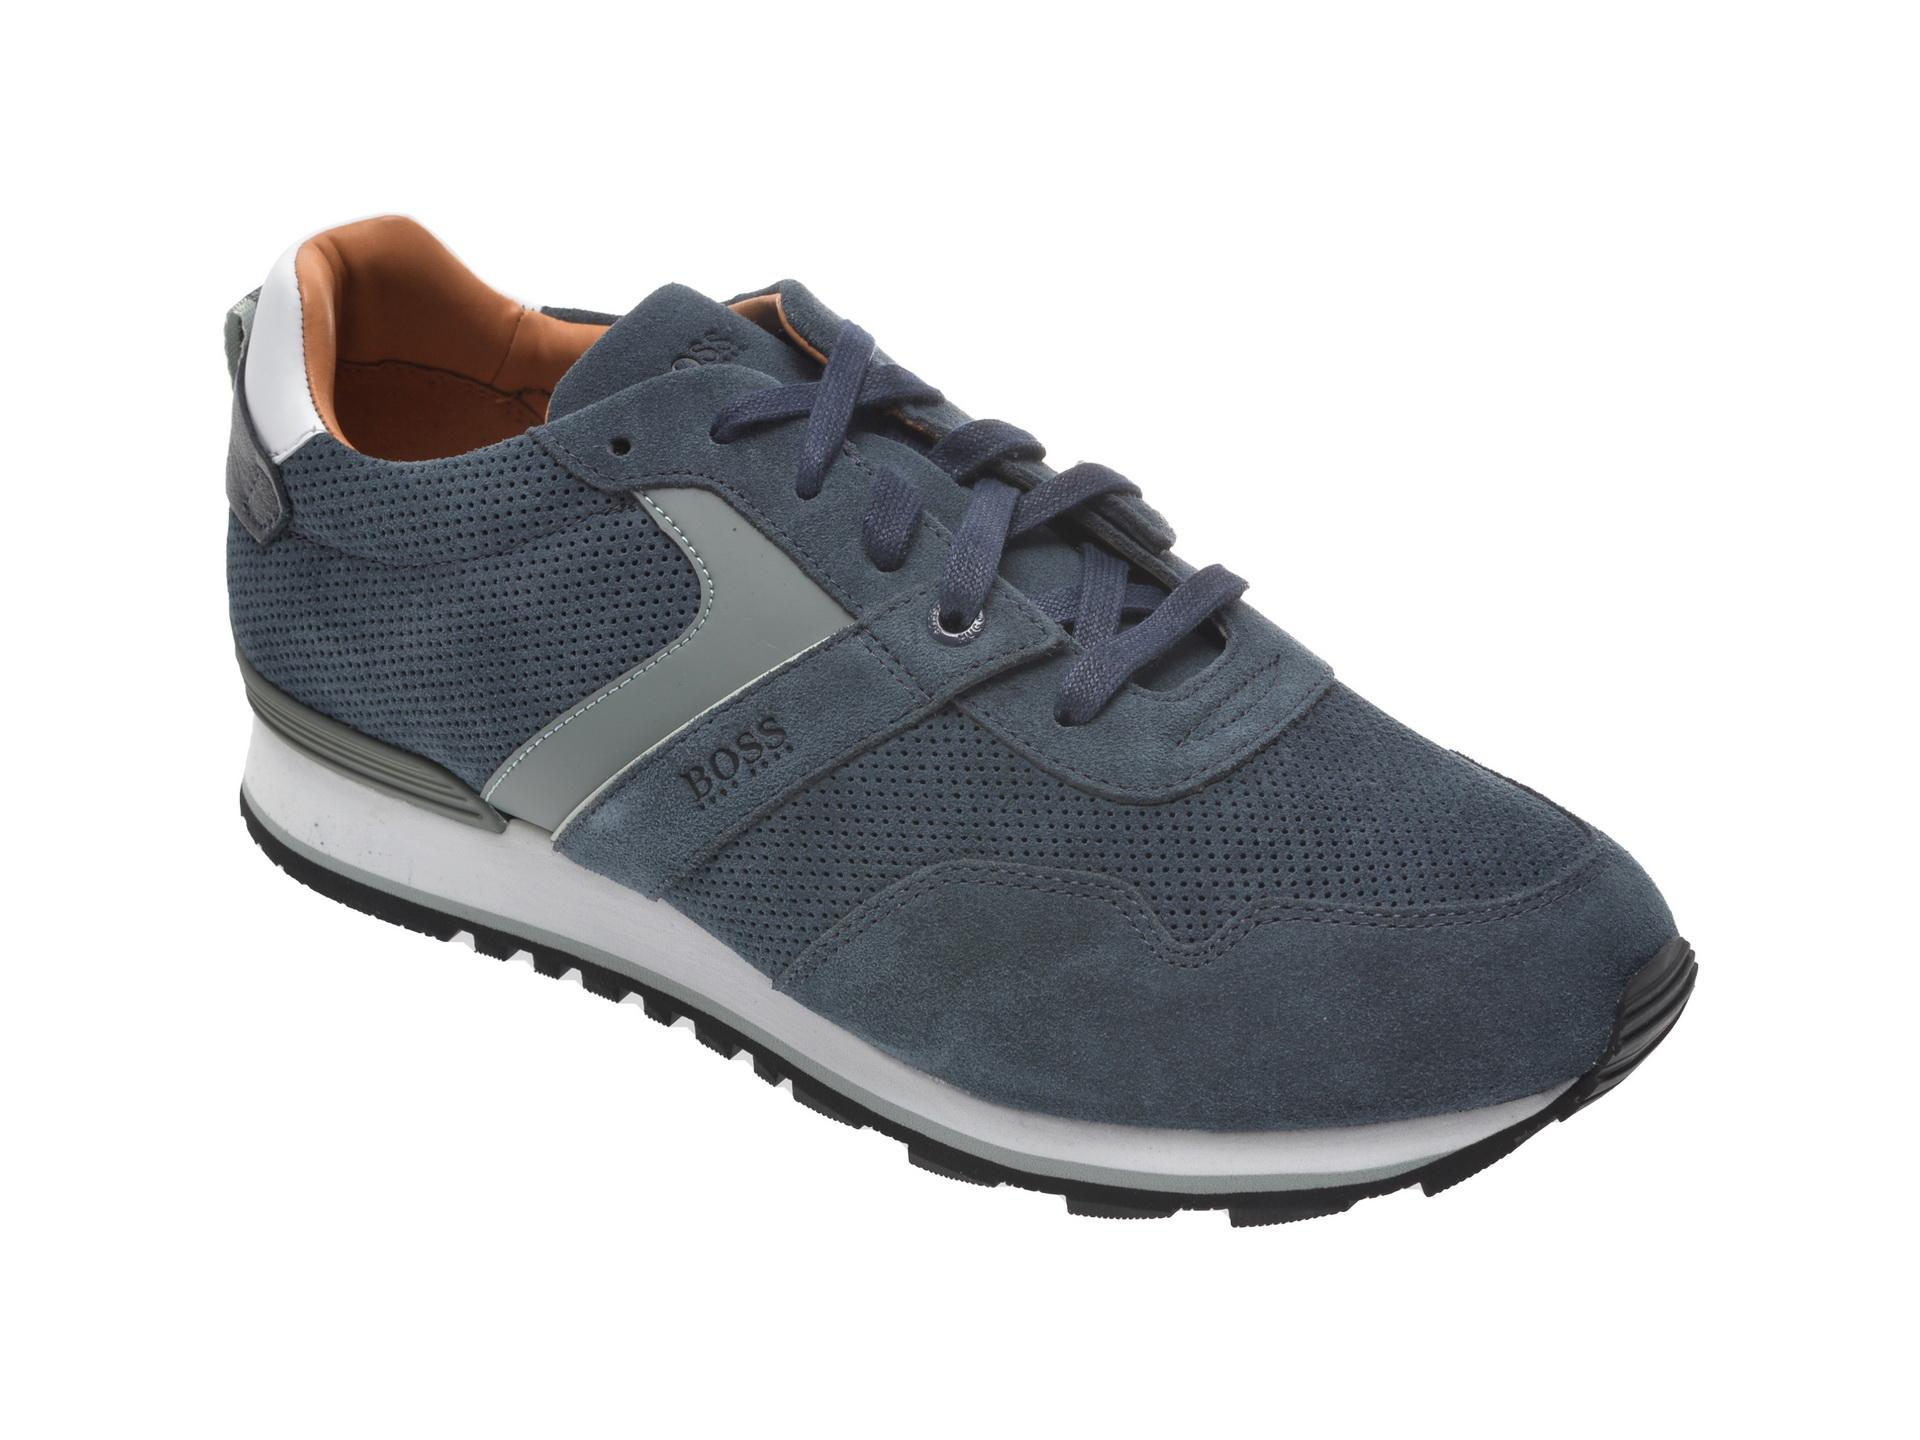 Pantofi sport HUGO BOSS bleumarin, 8495, din piele intoarsa